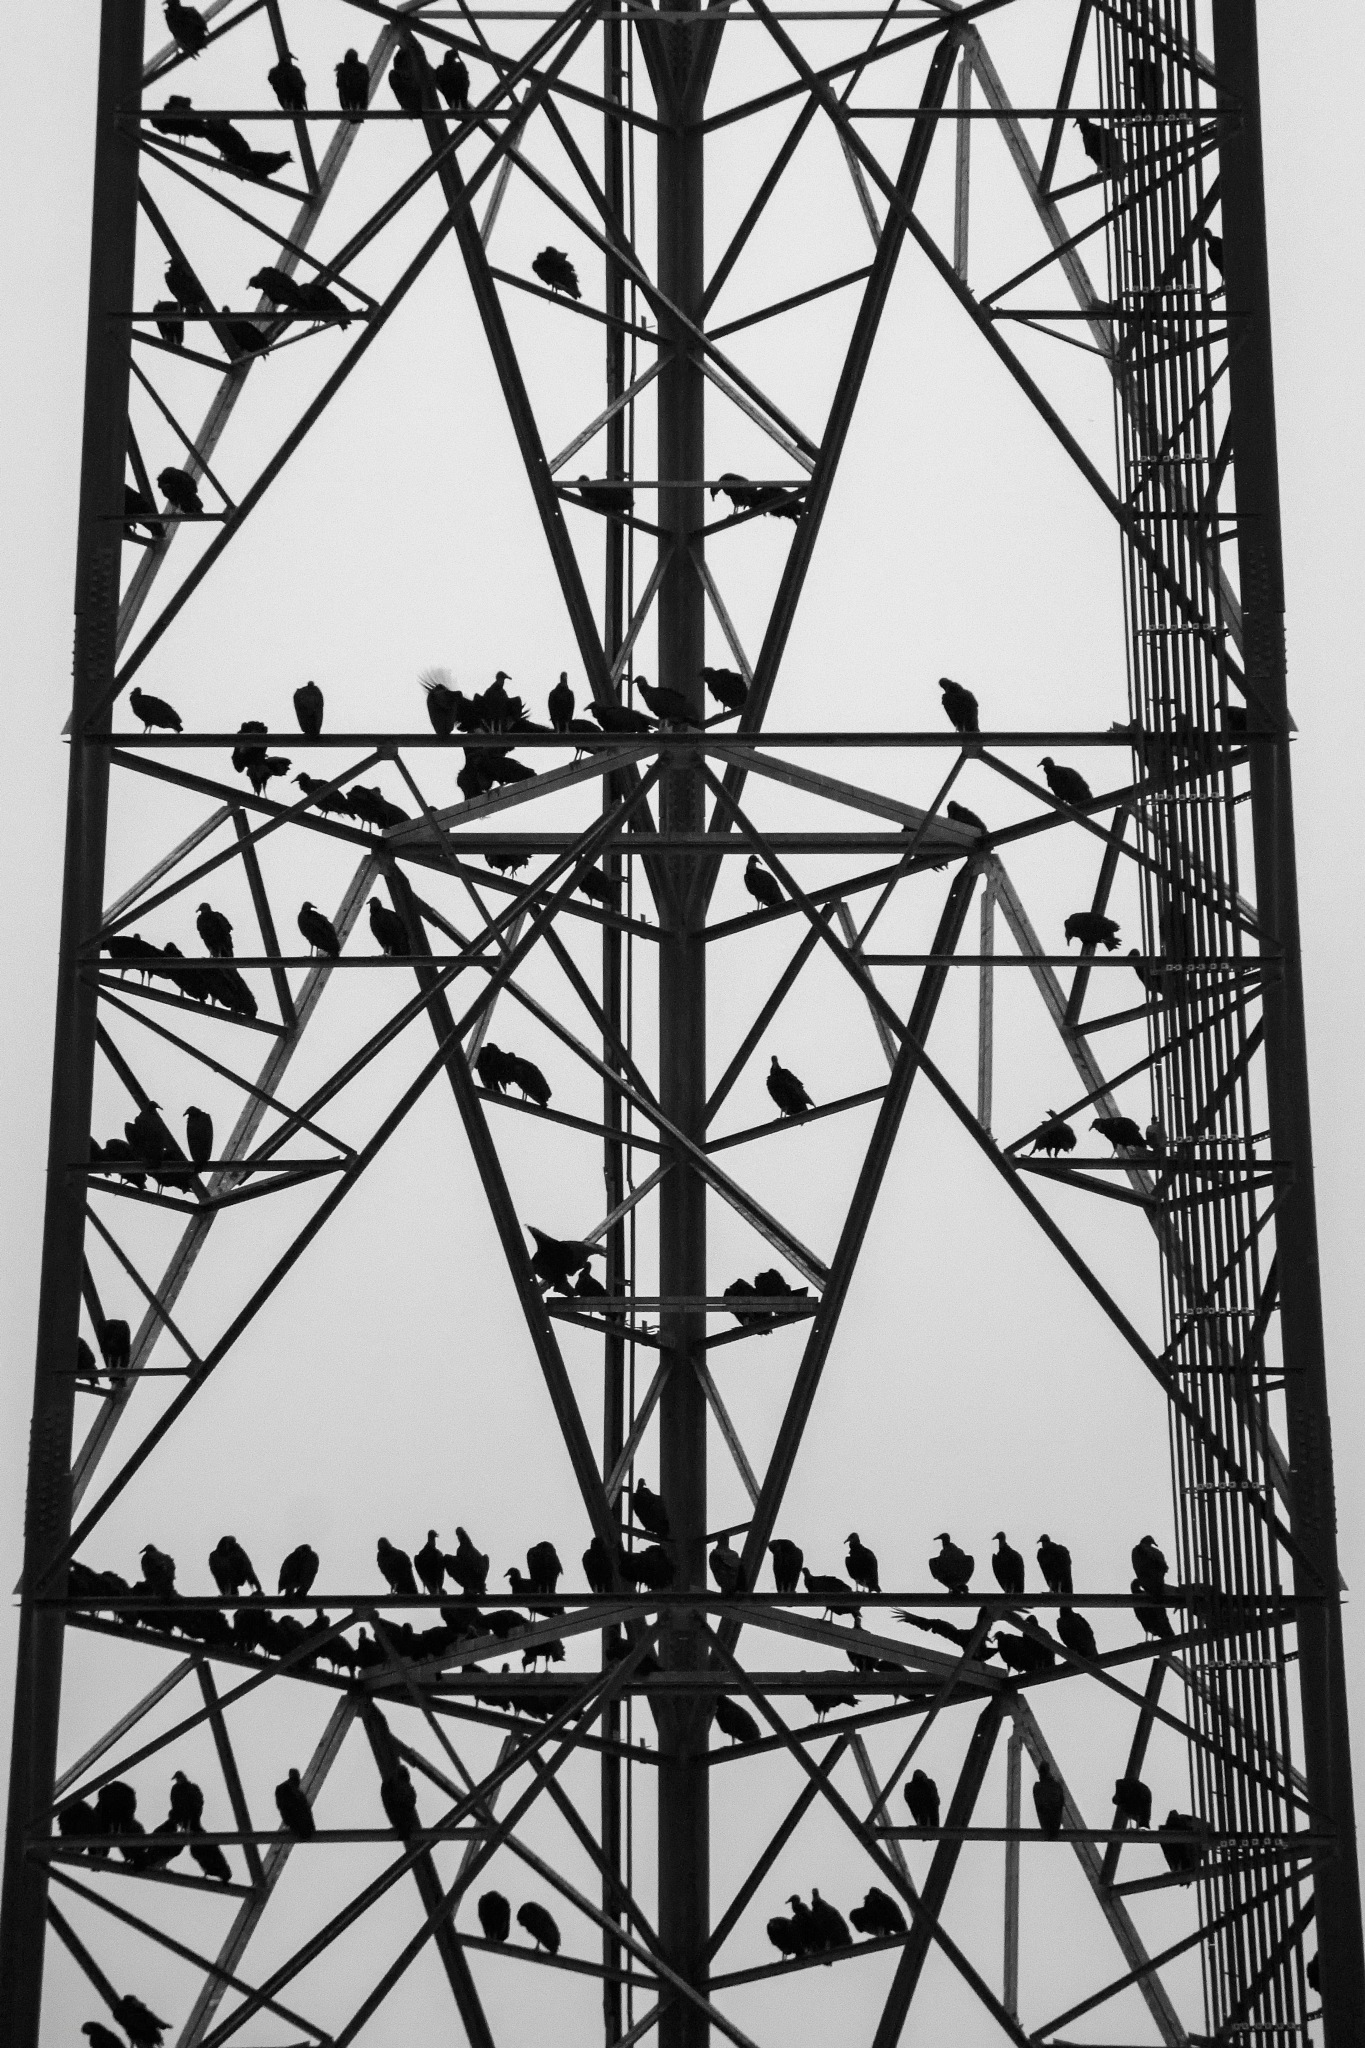 Black Vultures by Joe Saladino